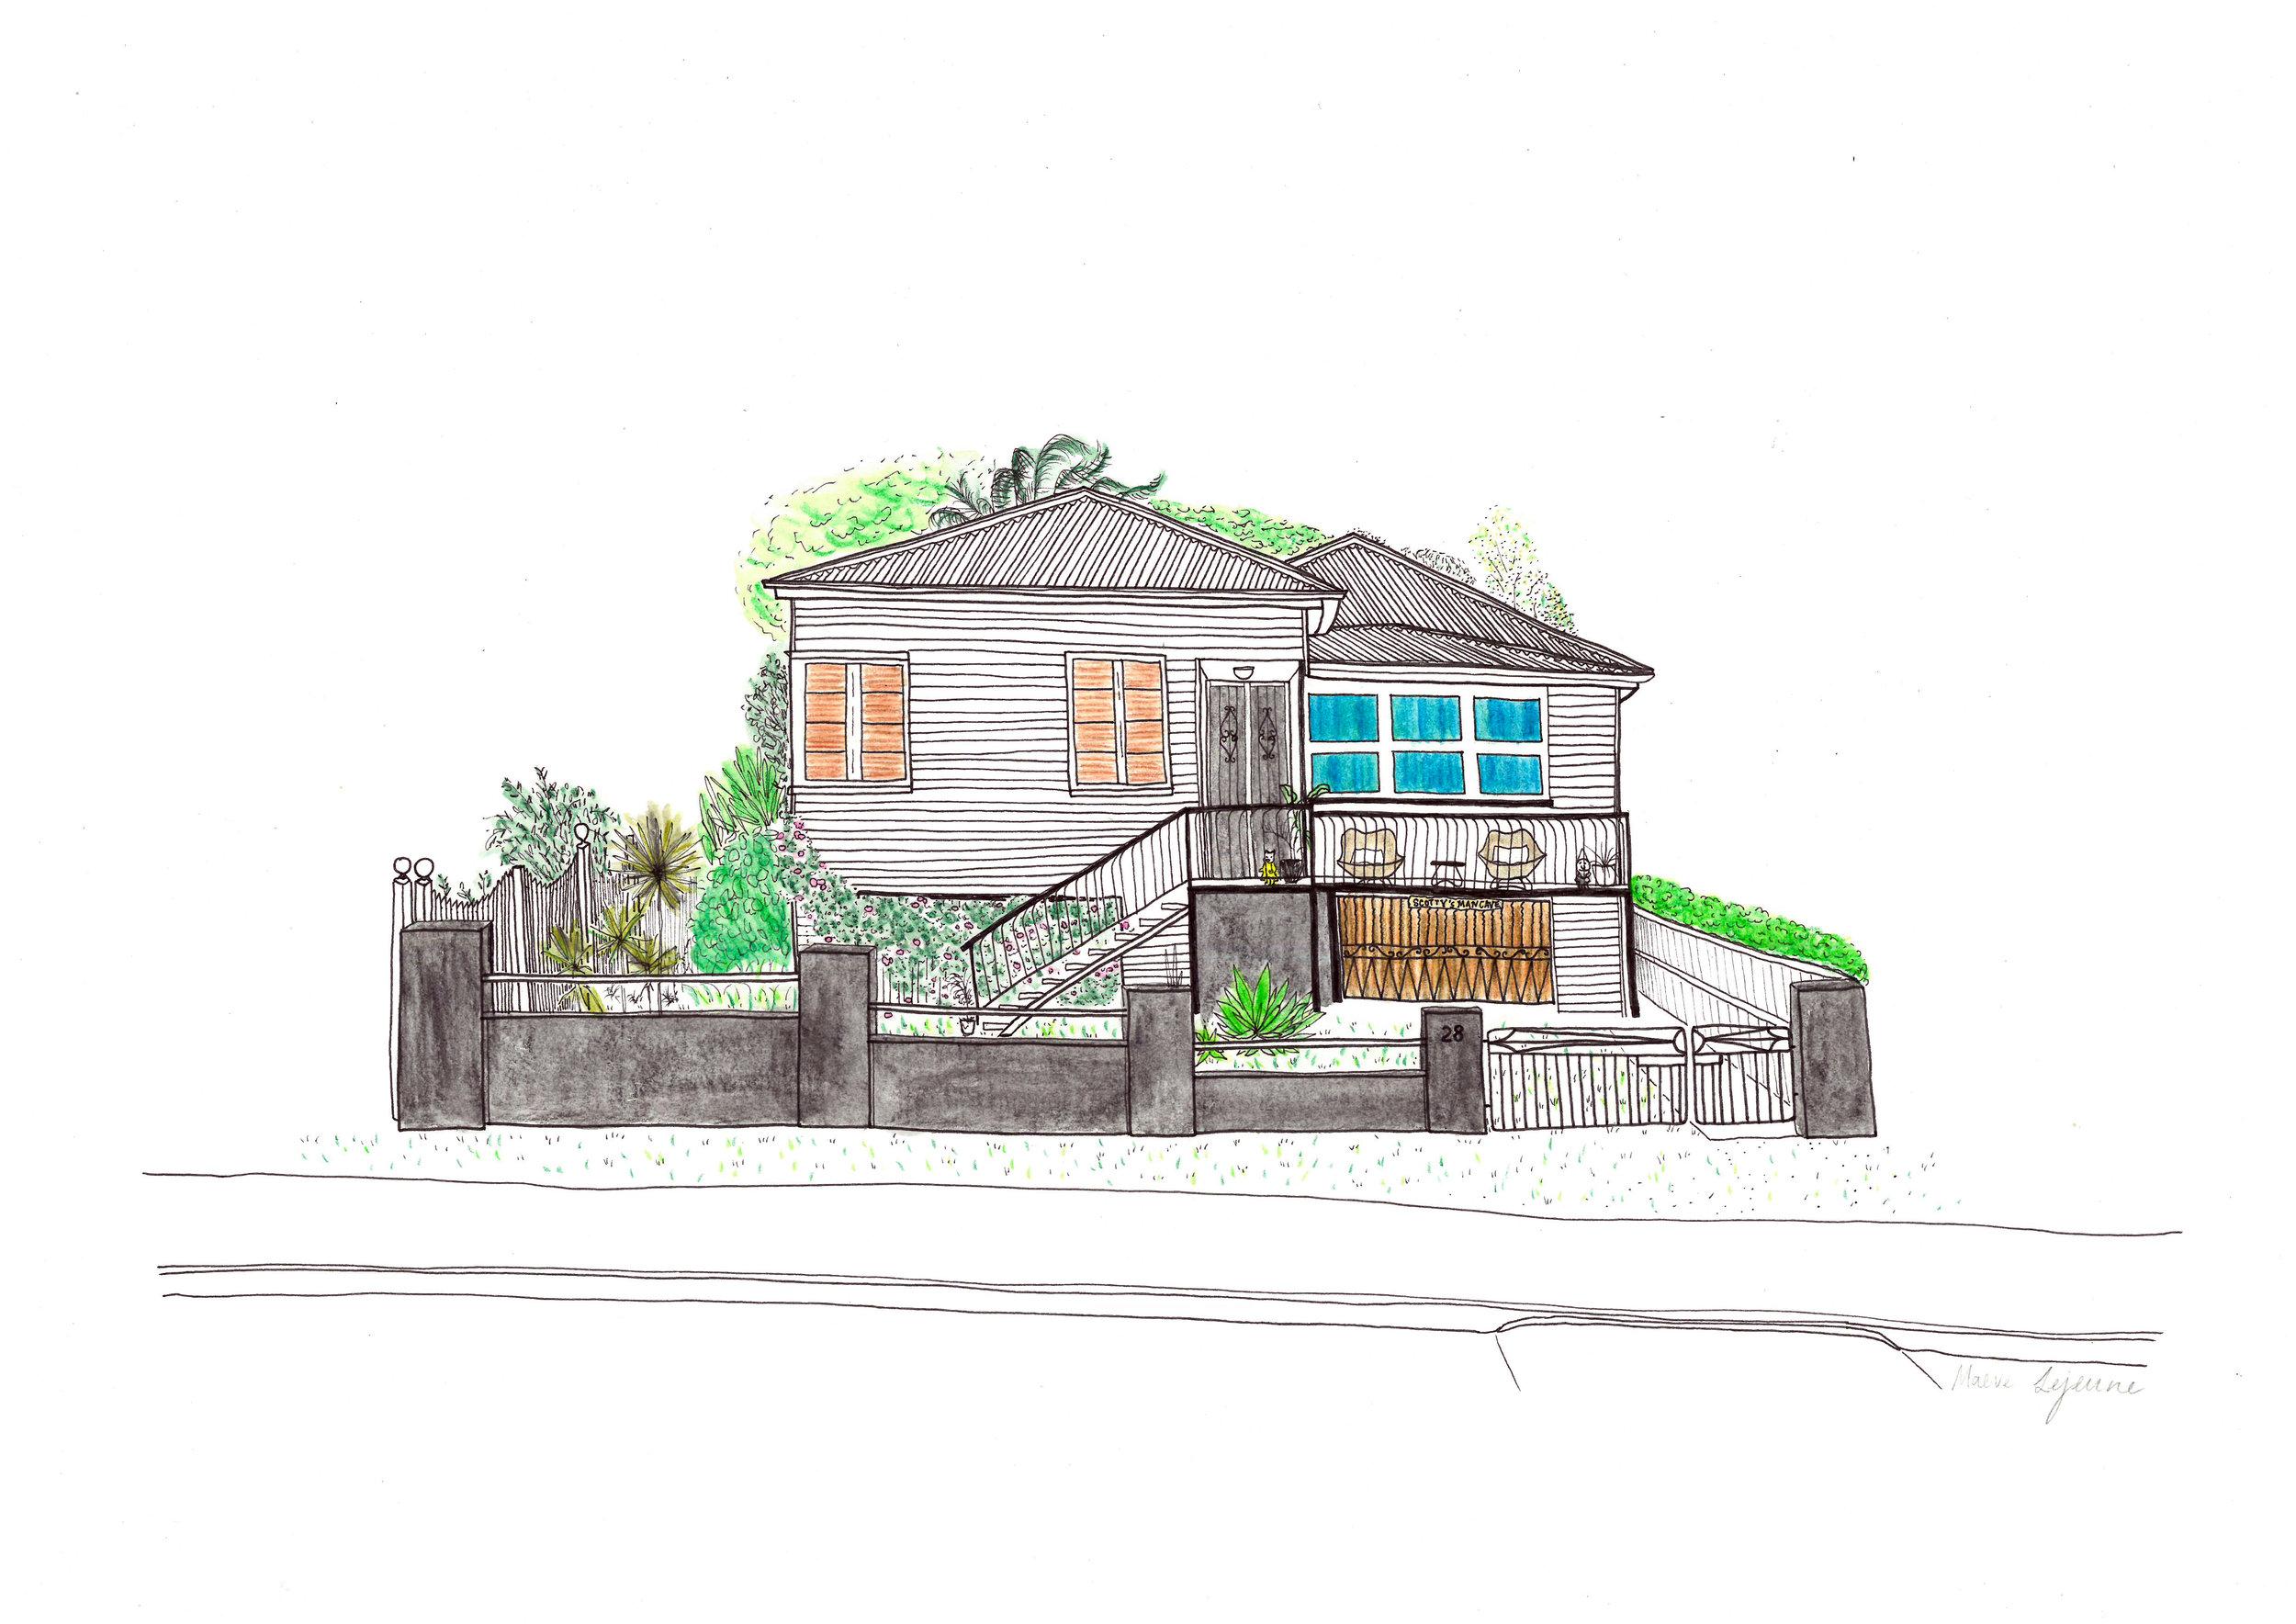 #15 Gemma's House